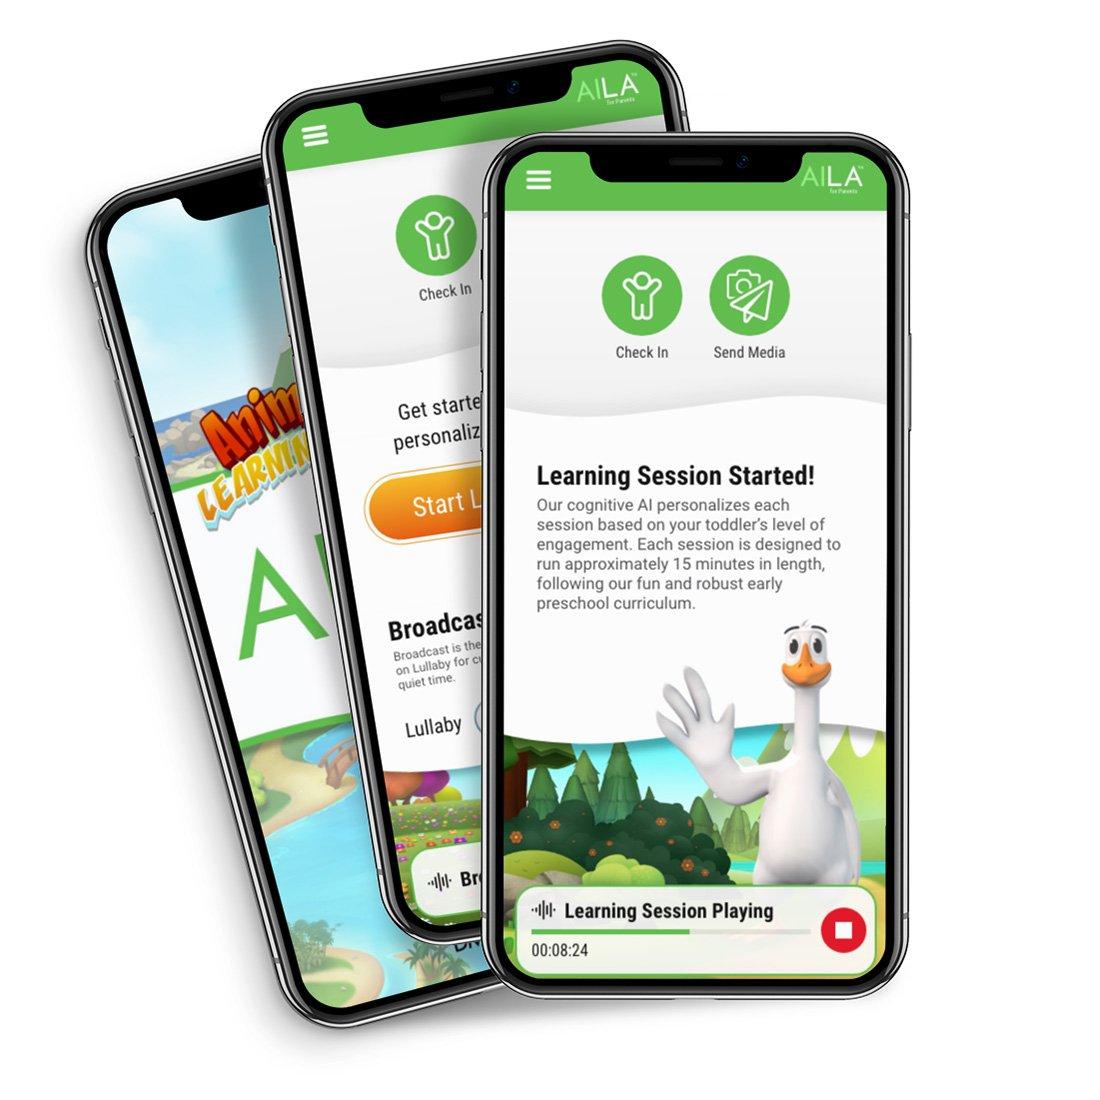 aila-parent-app-iphones